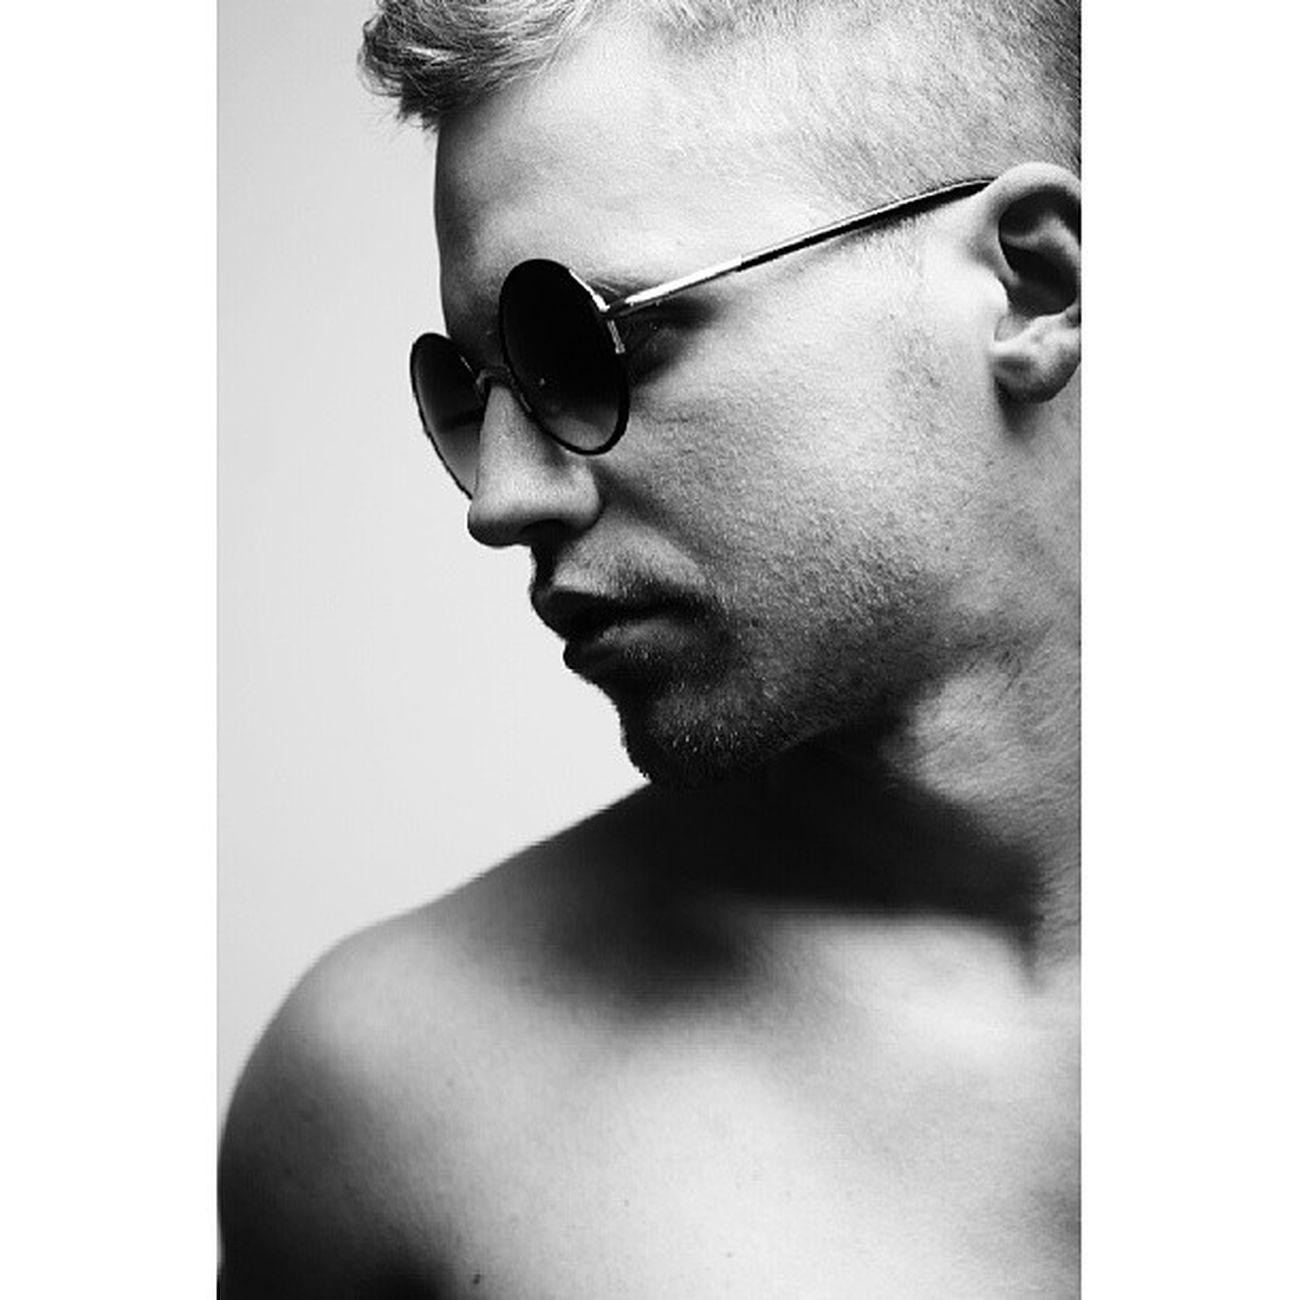 Man Pavelkiselevphotos Swag